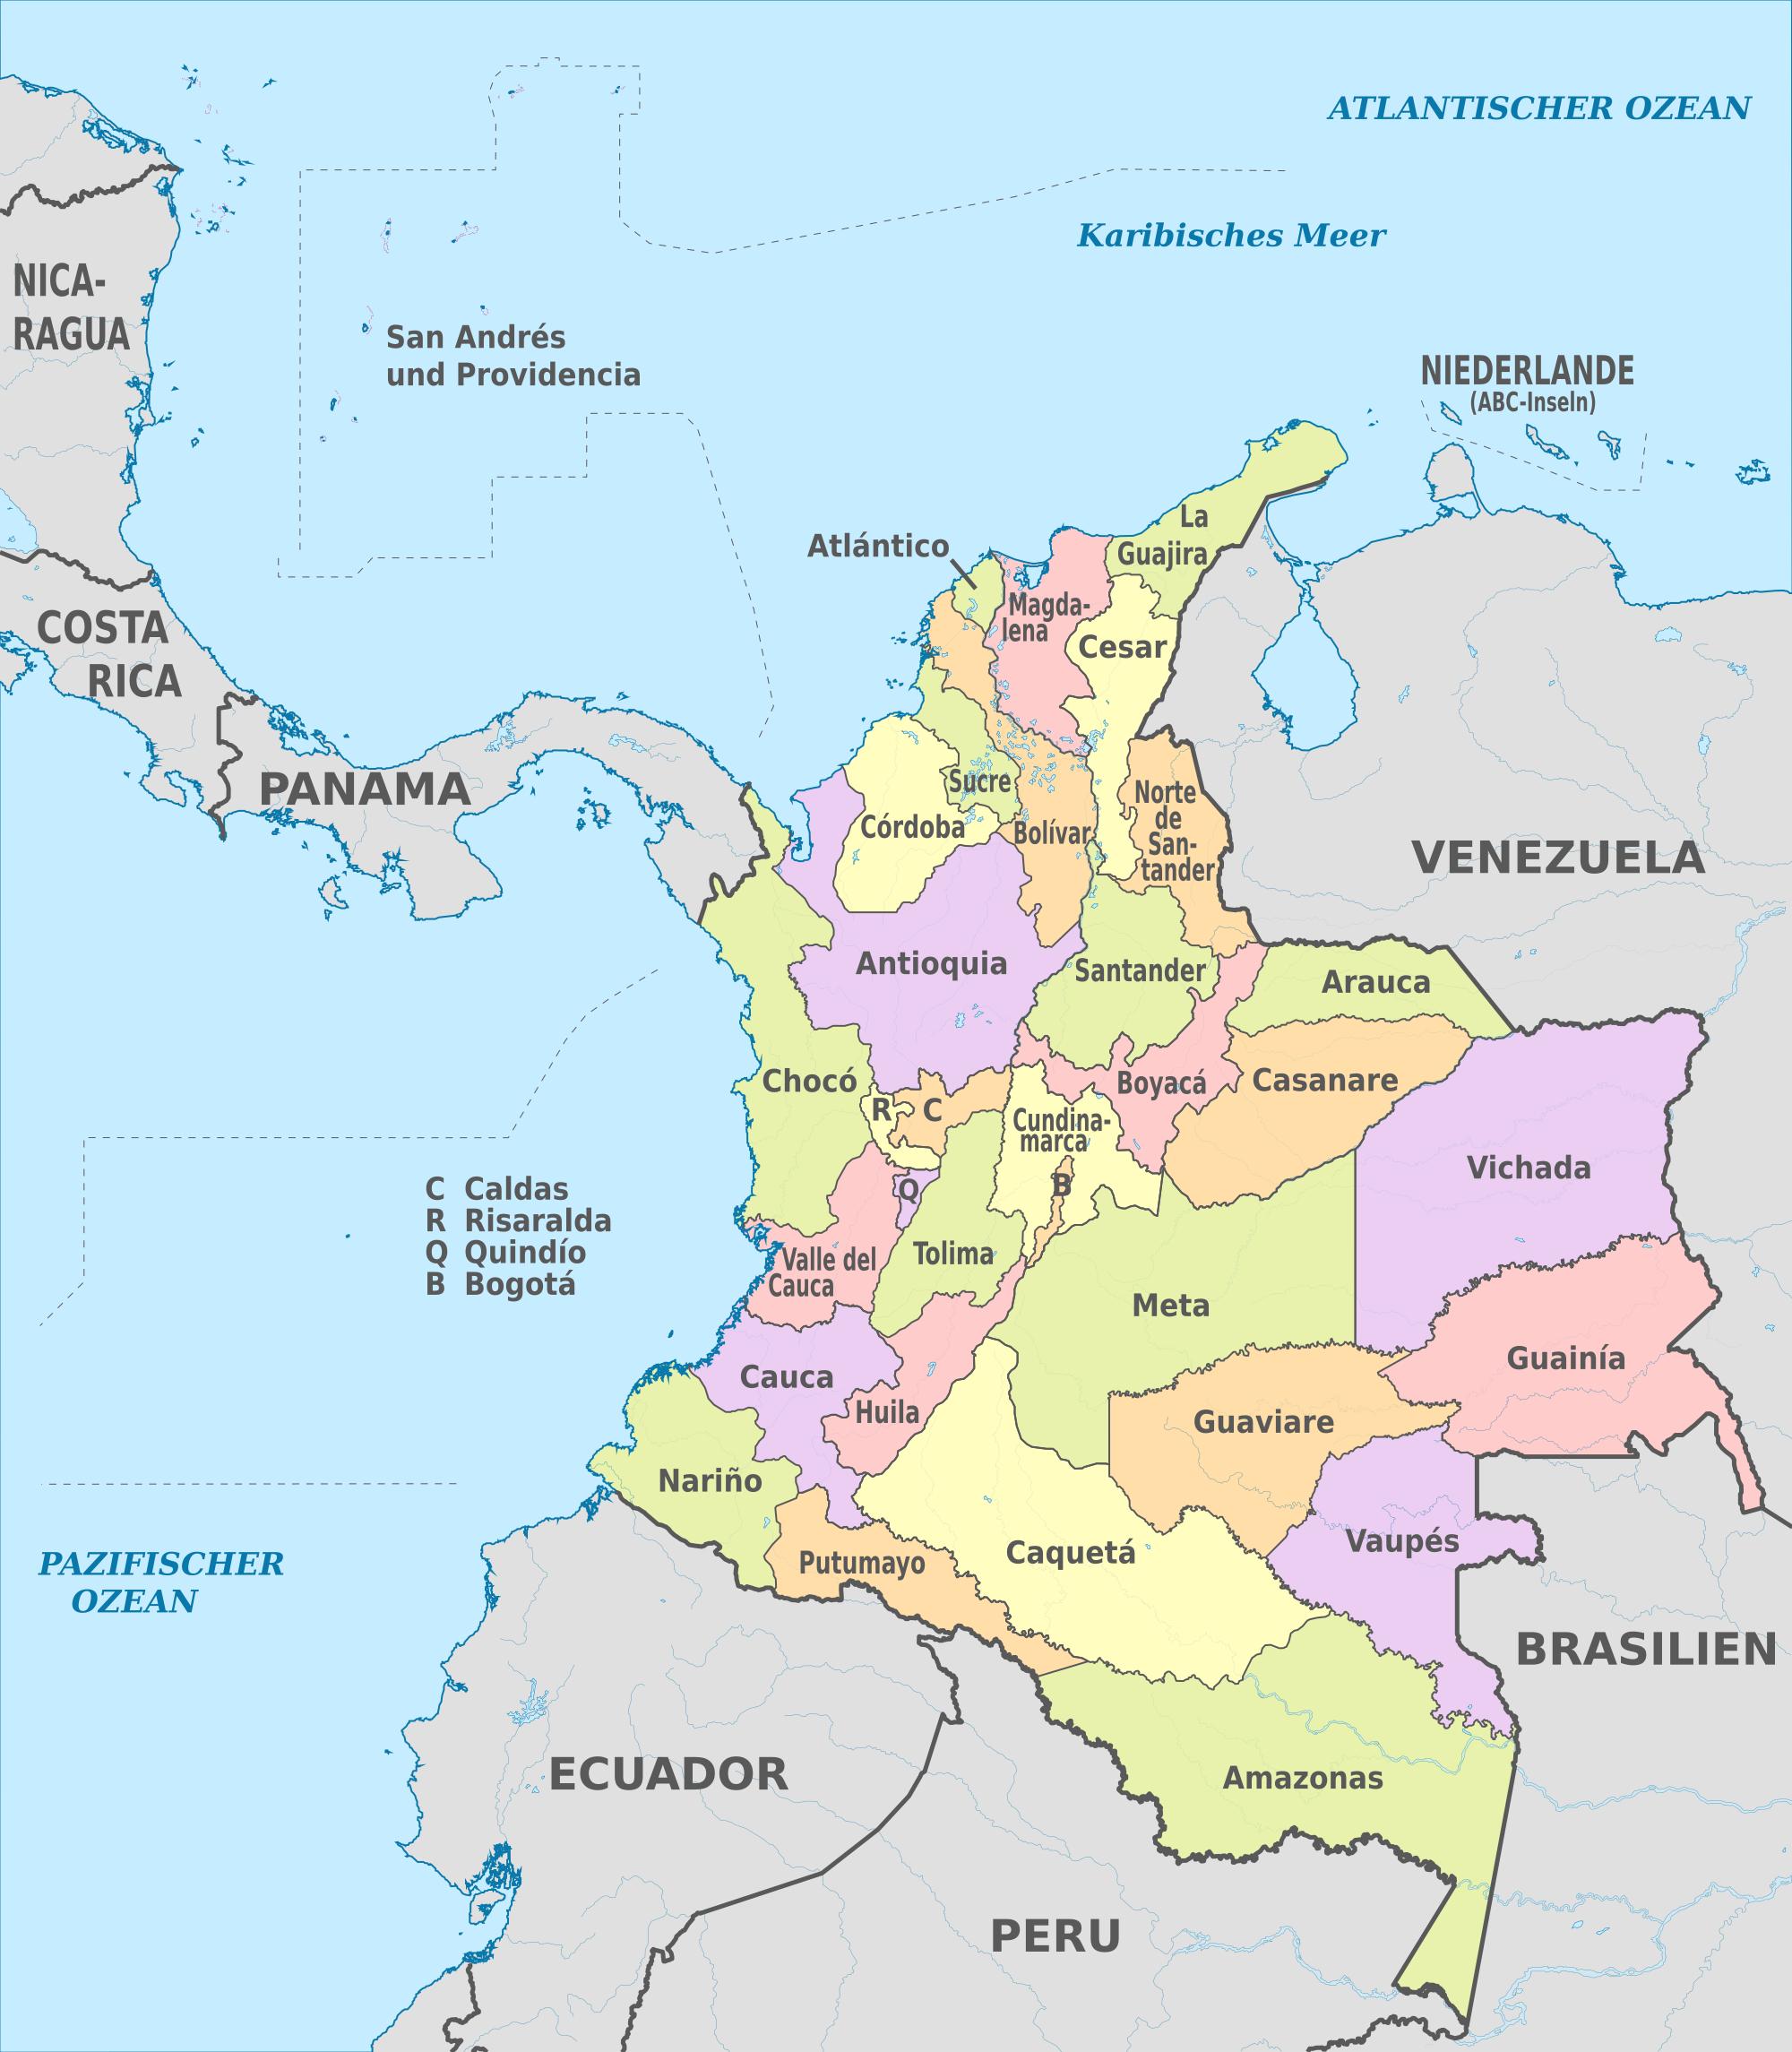 Mapa politico de Colombia hd 4